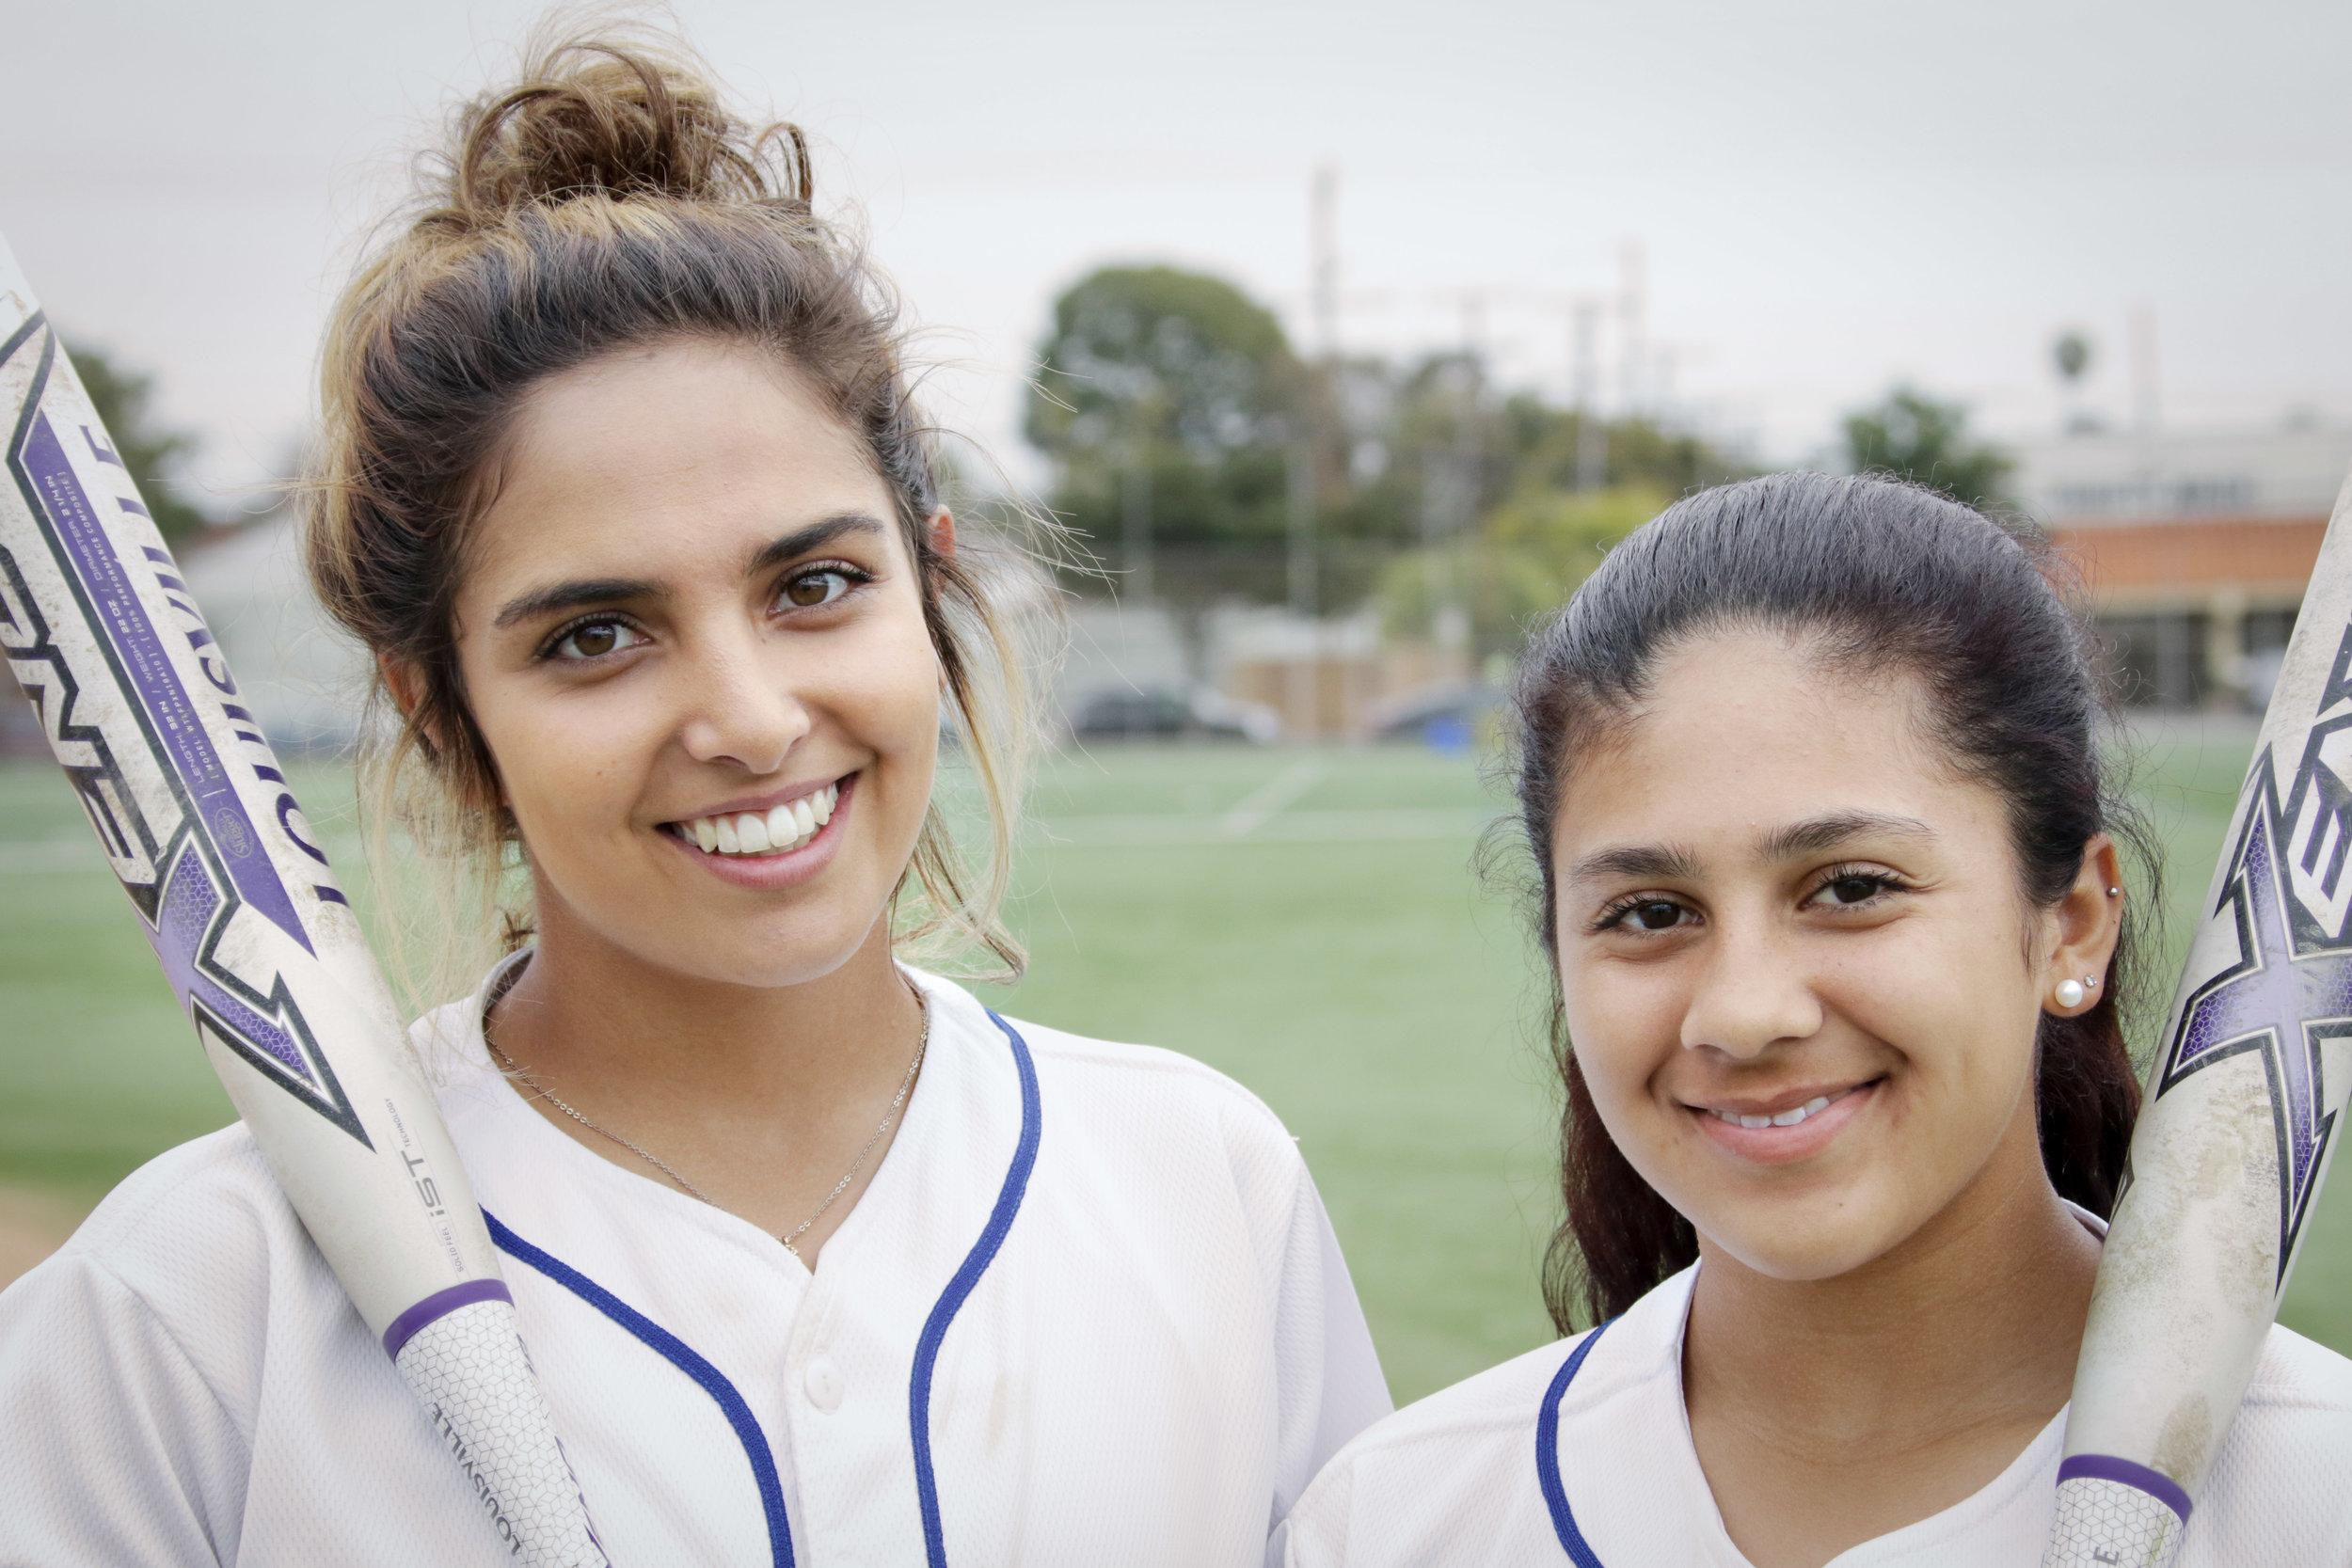 Santa Monica College Corsairs Softball players Taylor Liebesman (Left), and Nicole Valdez (Right). (Santa Monica, California. Tuesday, March 27, 2018.) Ashutosh Bikram Singh/Corsair Staff